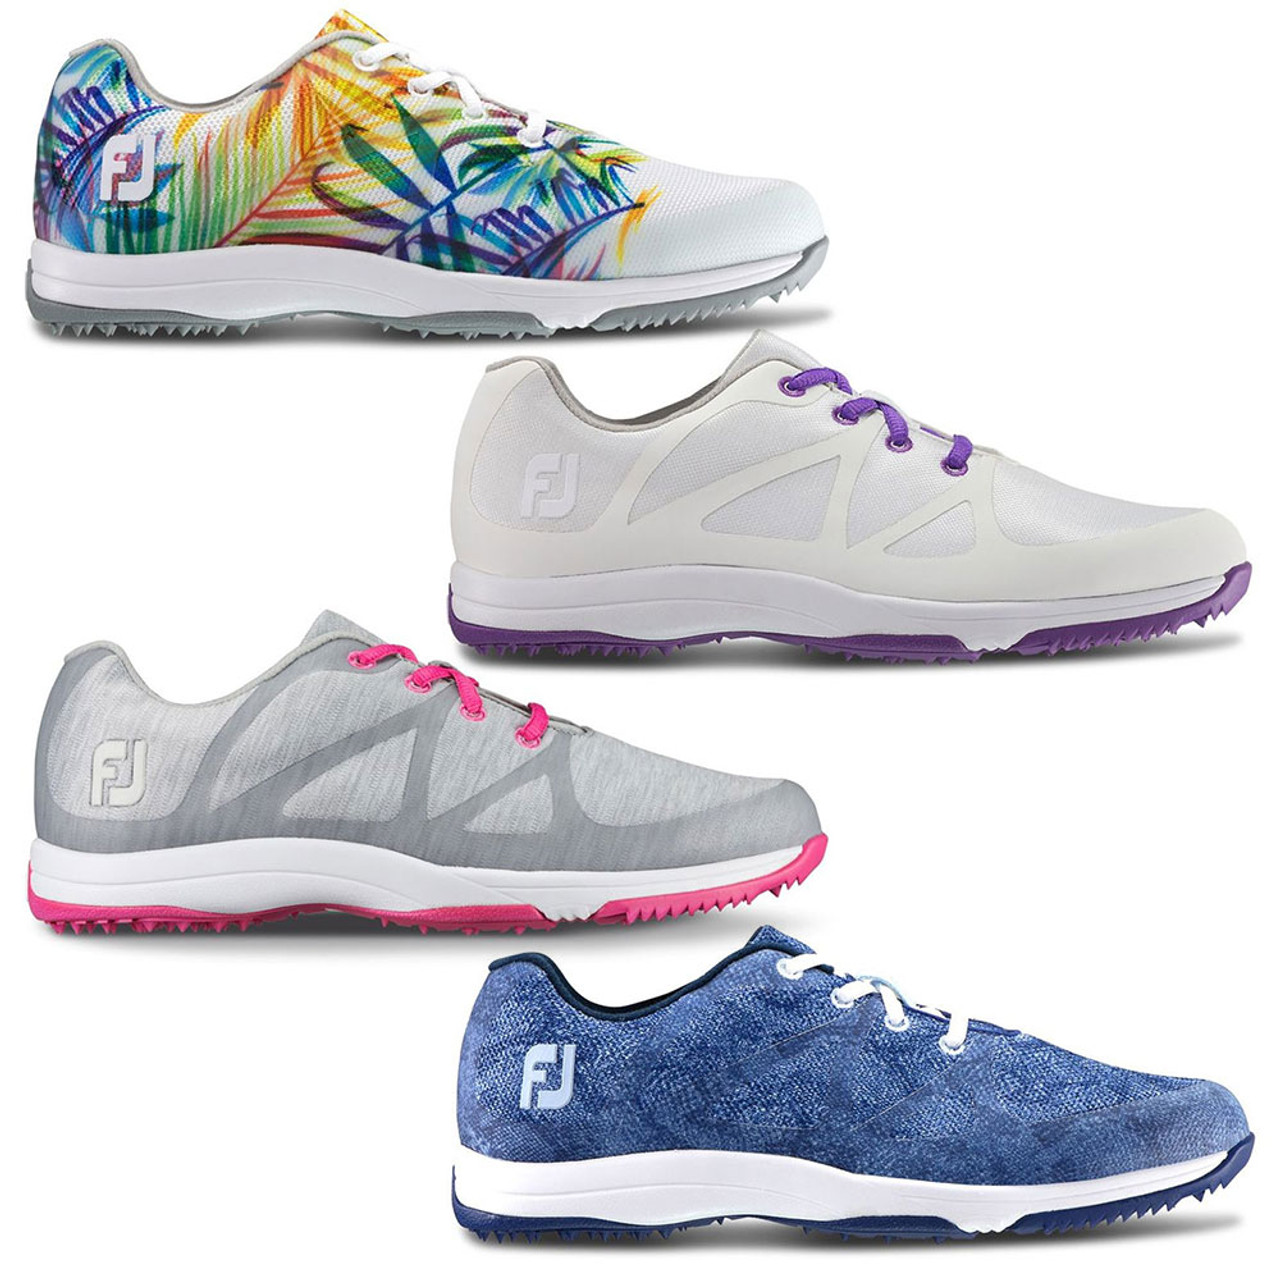 FootJoy Leisure Spikeless Golf Shoes